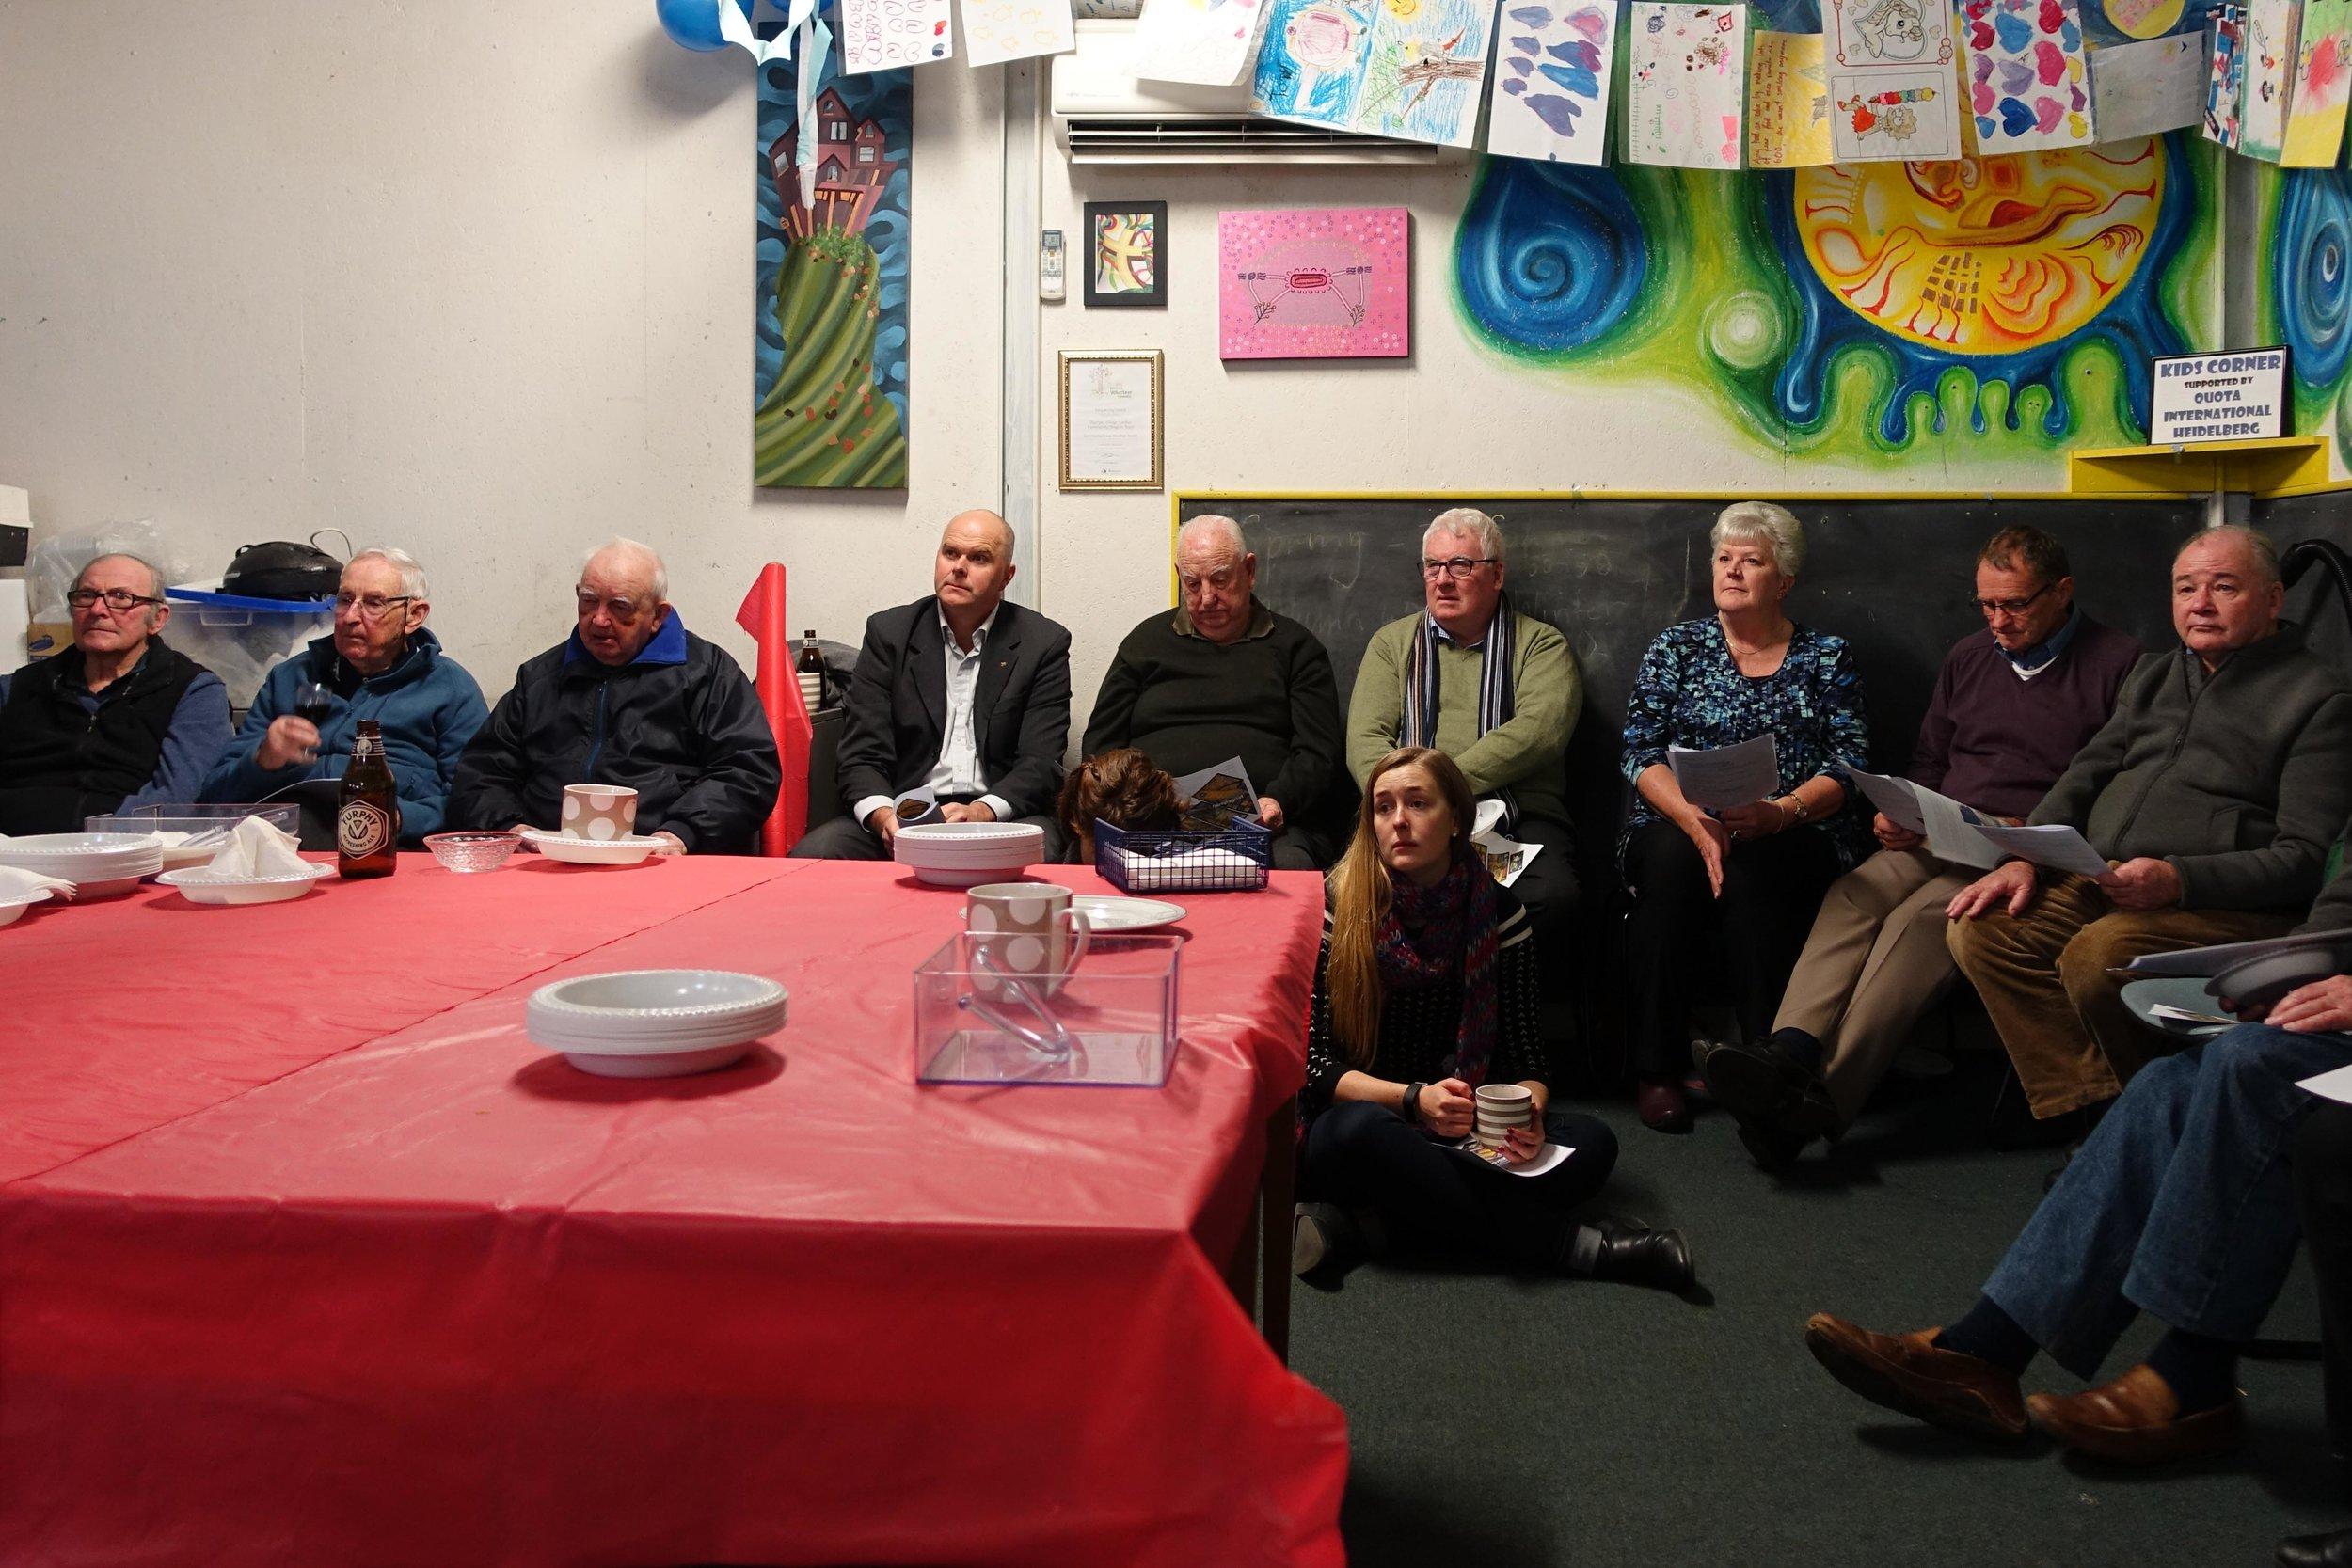 Melbourne Marists - Heidelberg West Gathering